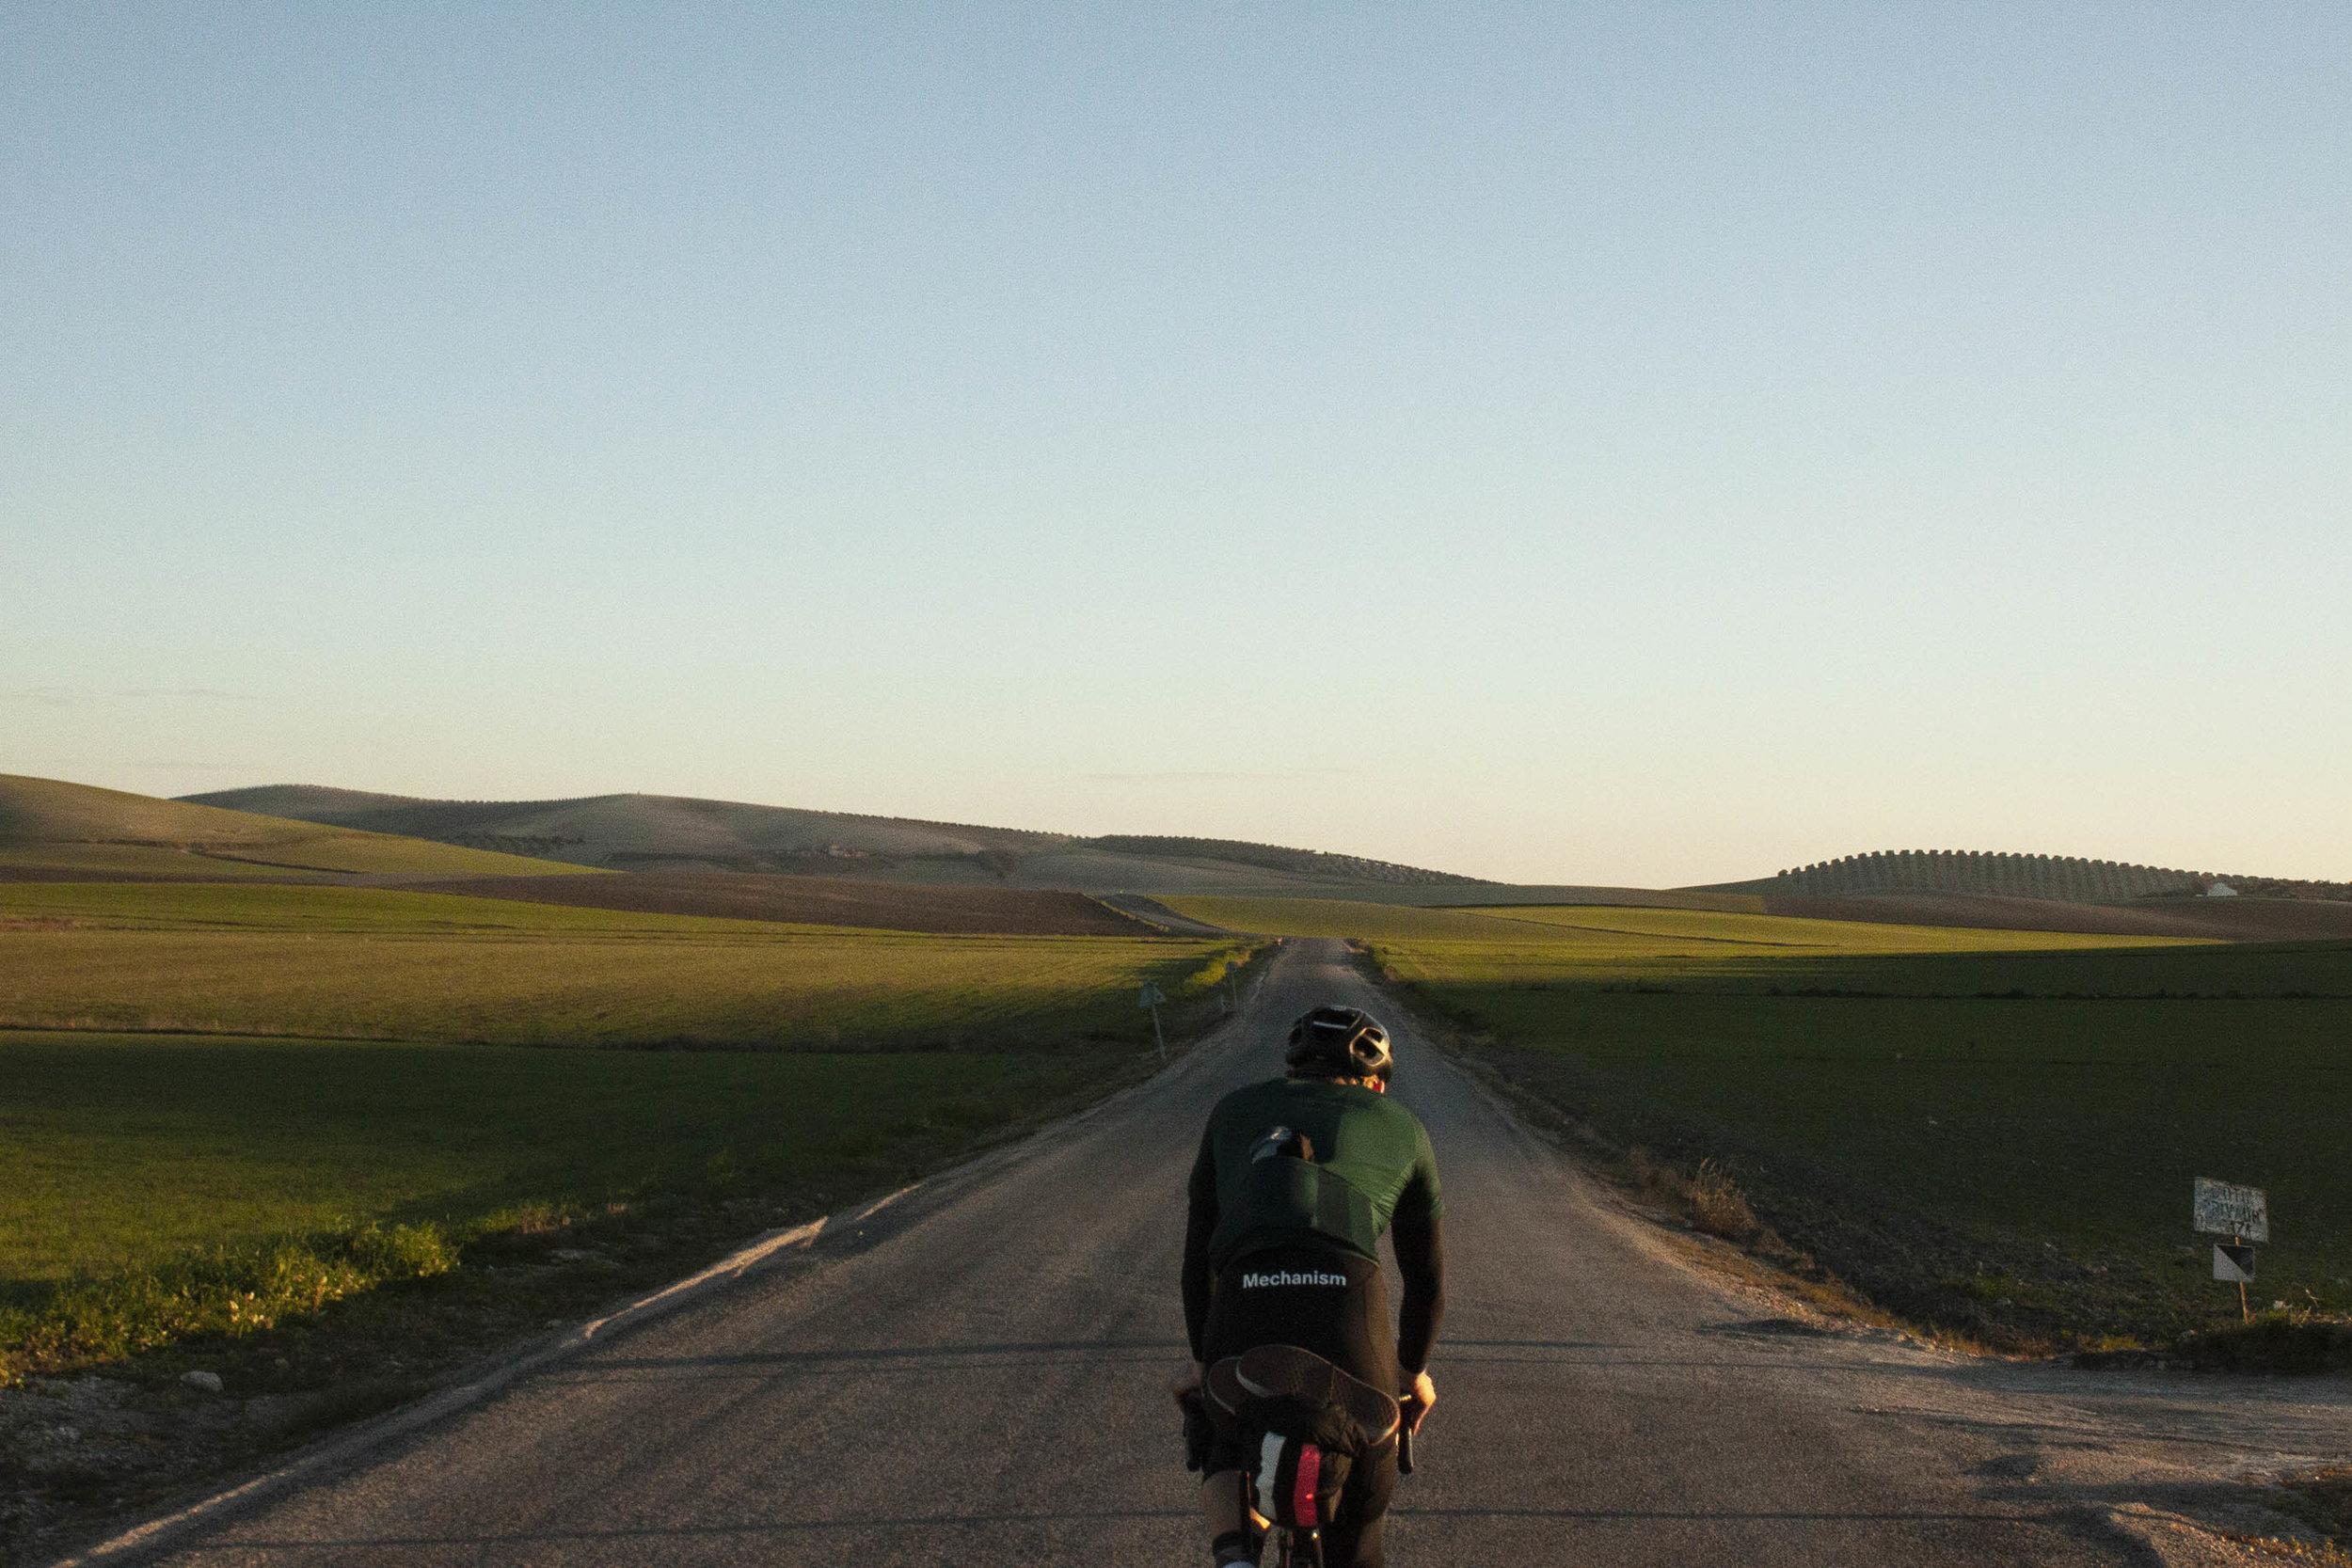 malaga-road-bike-rental-landscape3.jpg